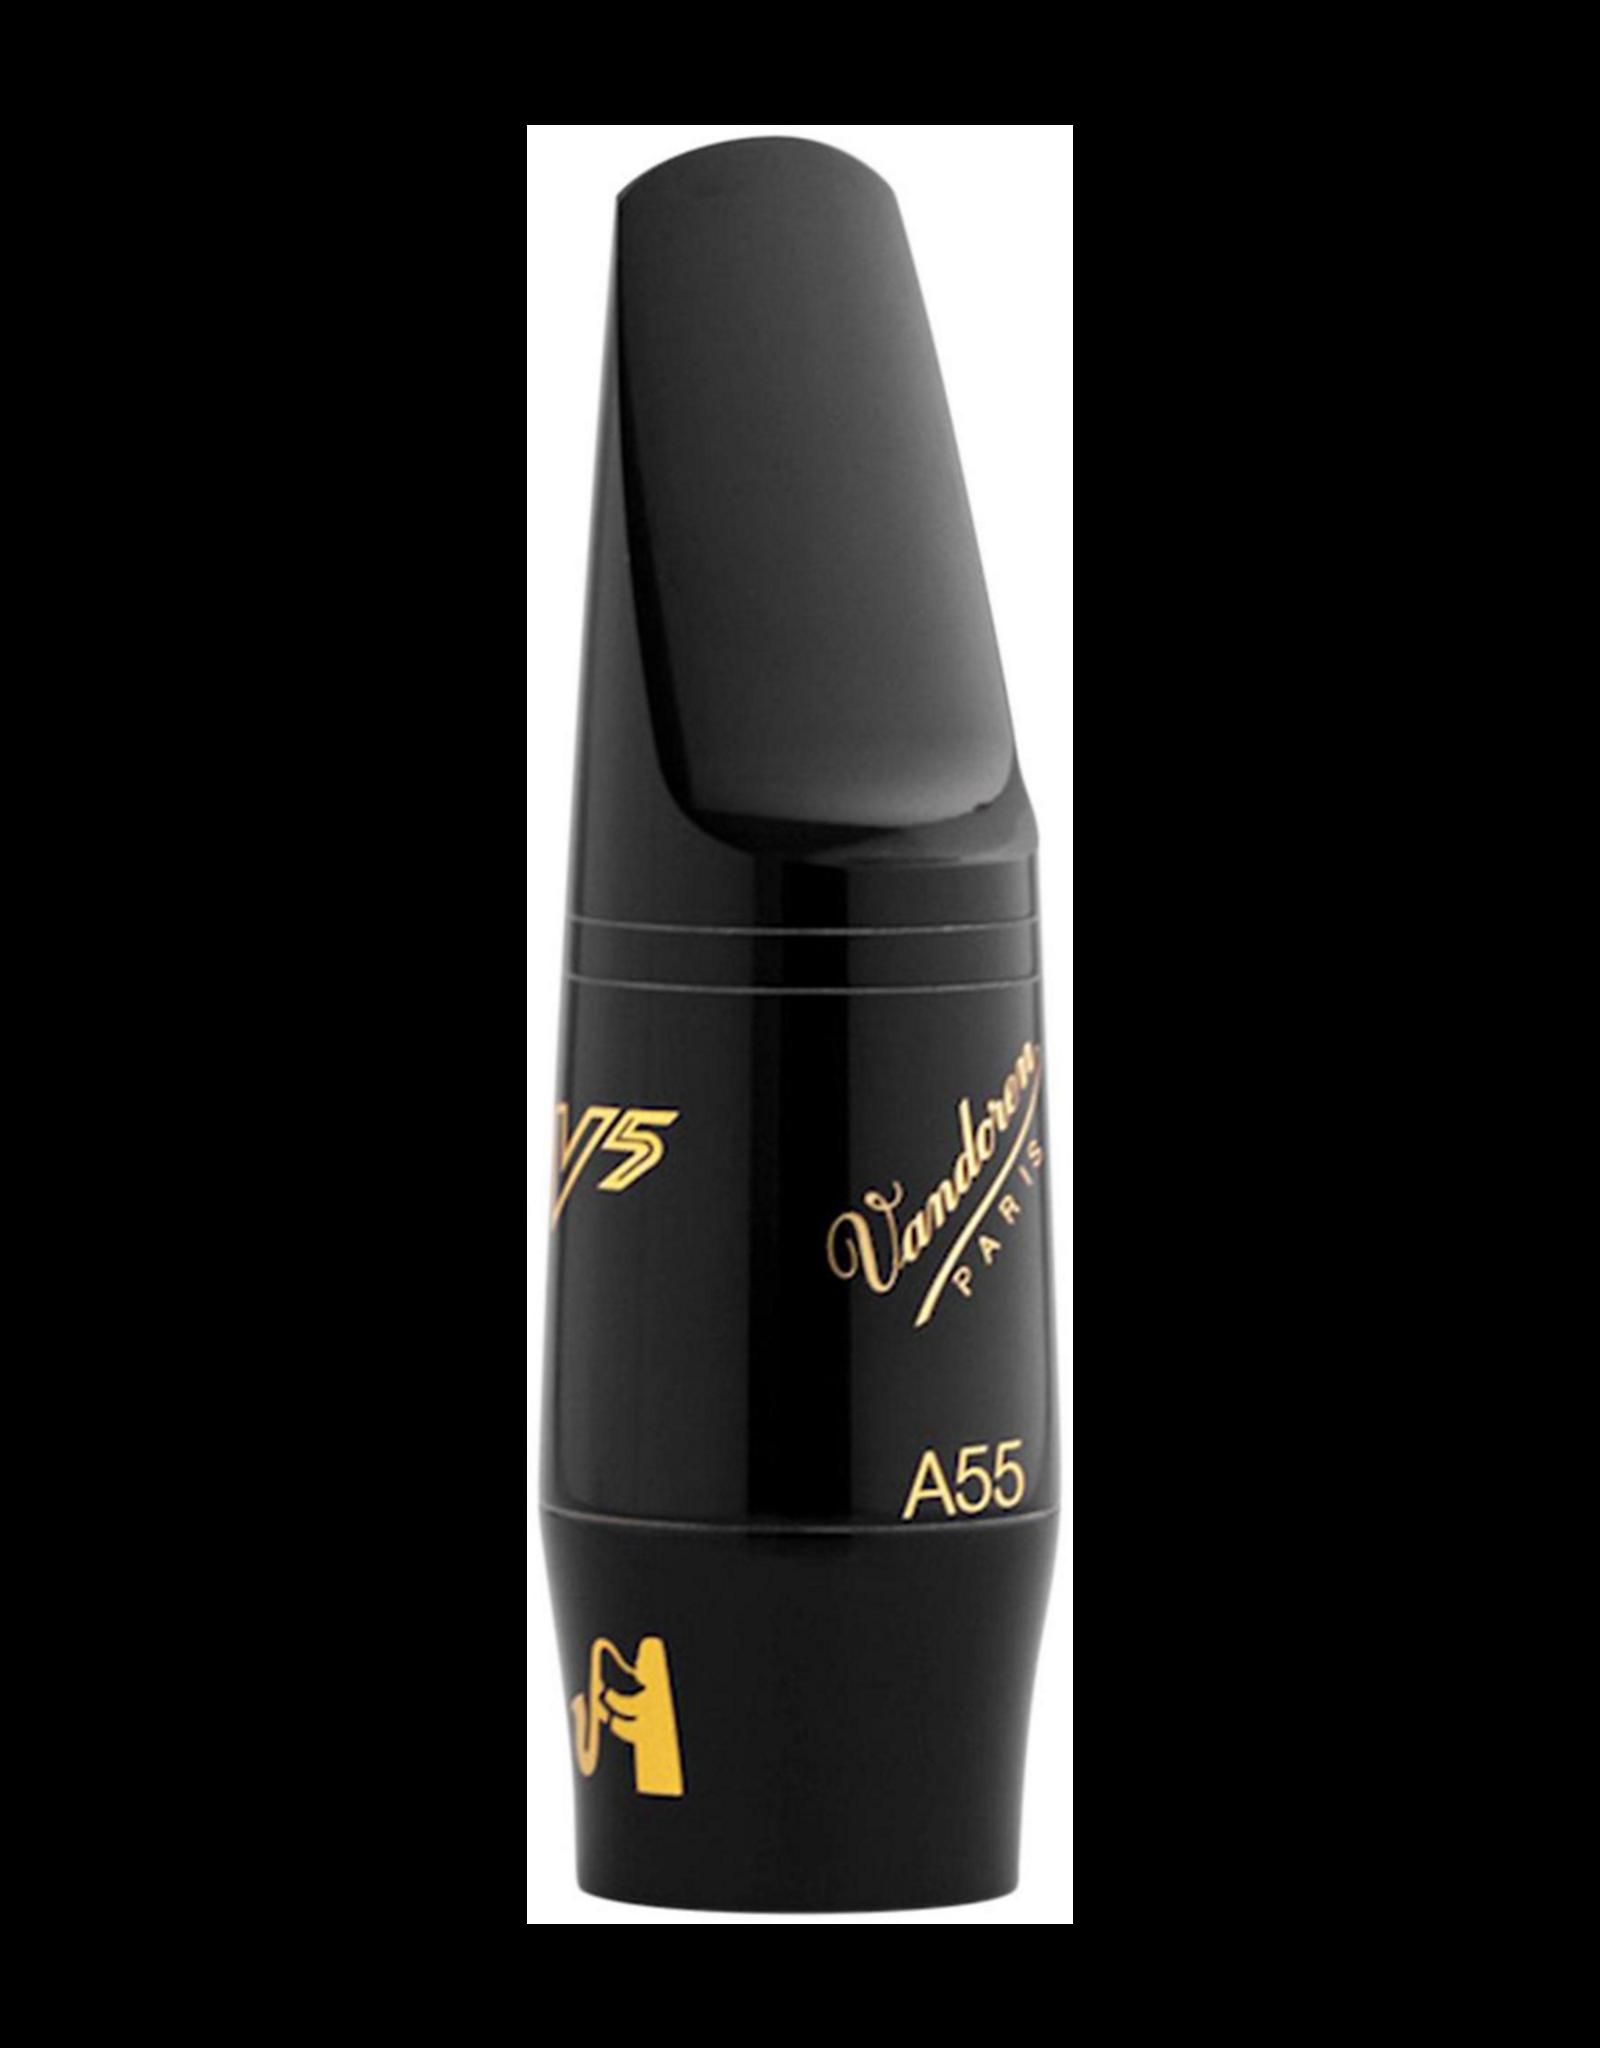 Vandoren Vandoren V5 Jazz Series Alto Saxophone Mouthpiece;